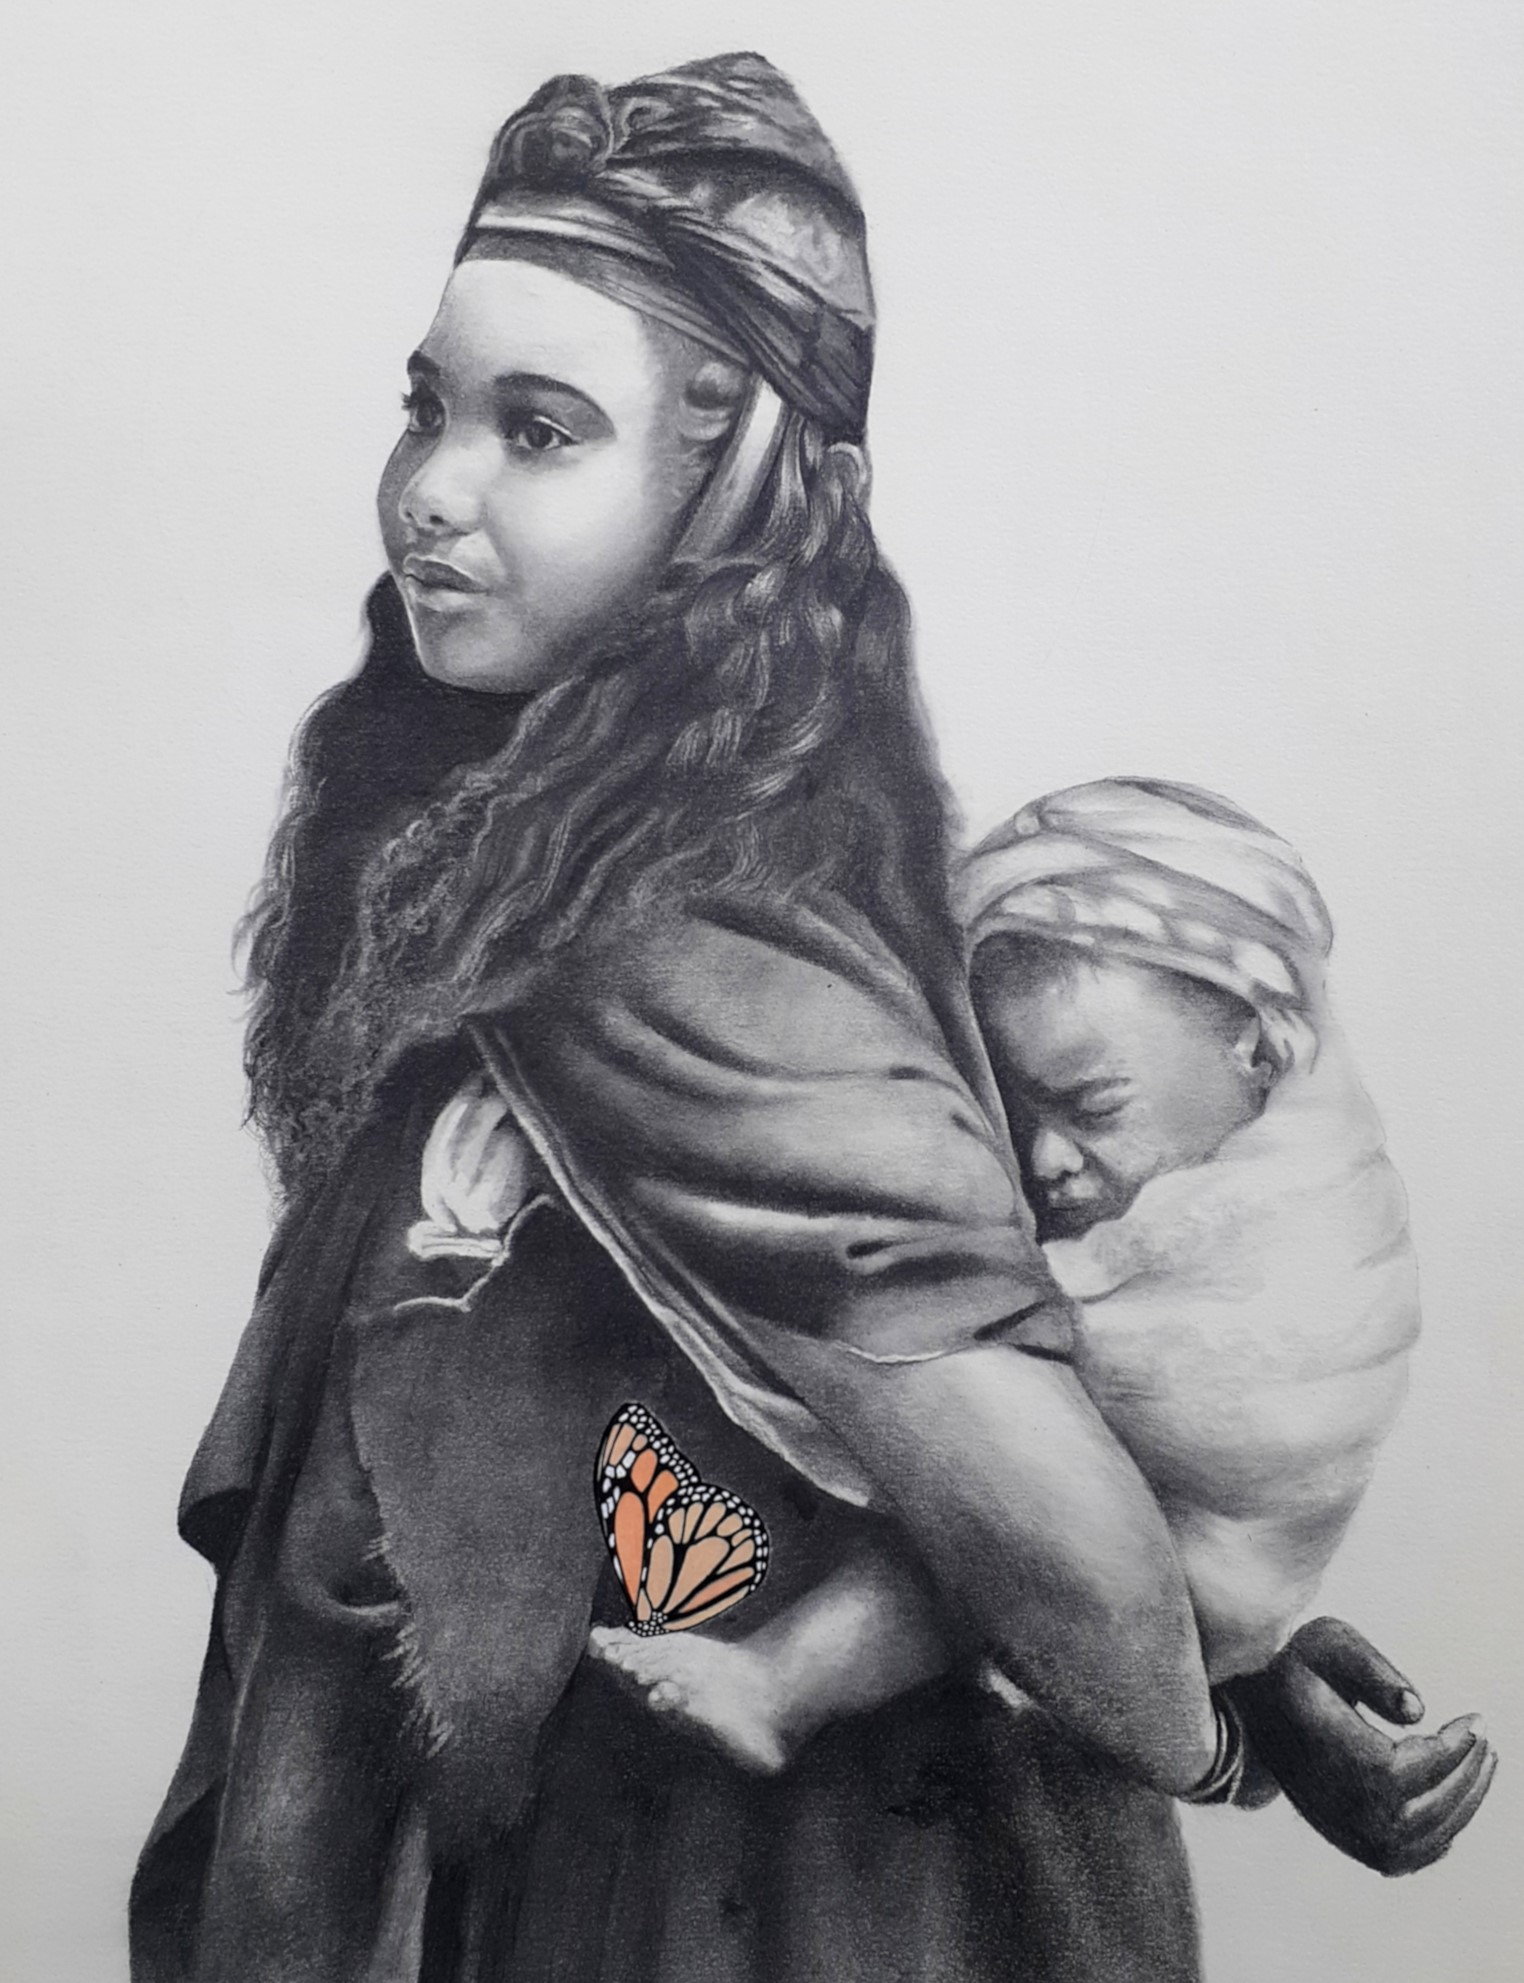 Mother And Child 2 Main Kati Garrett Filho